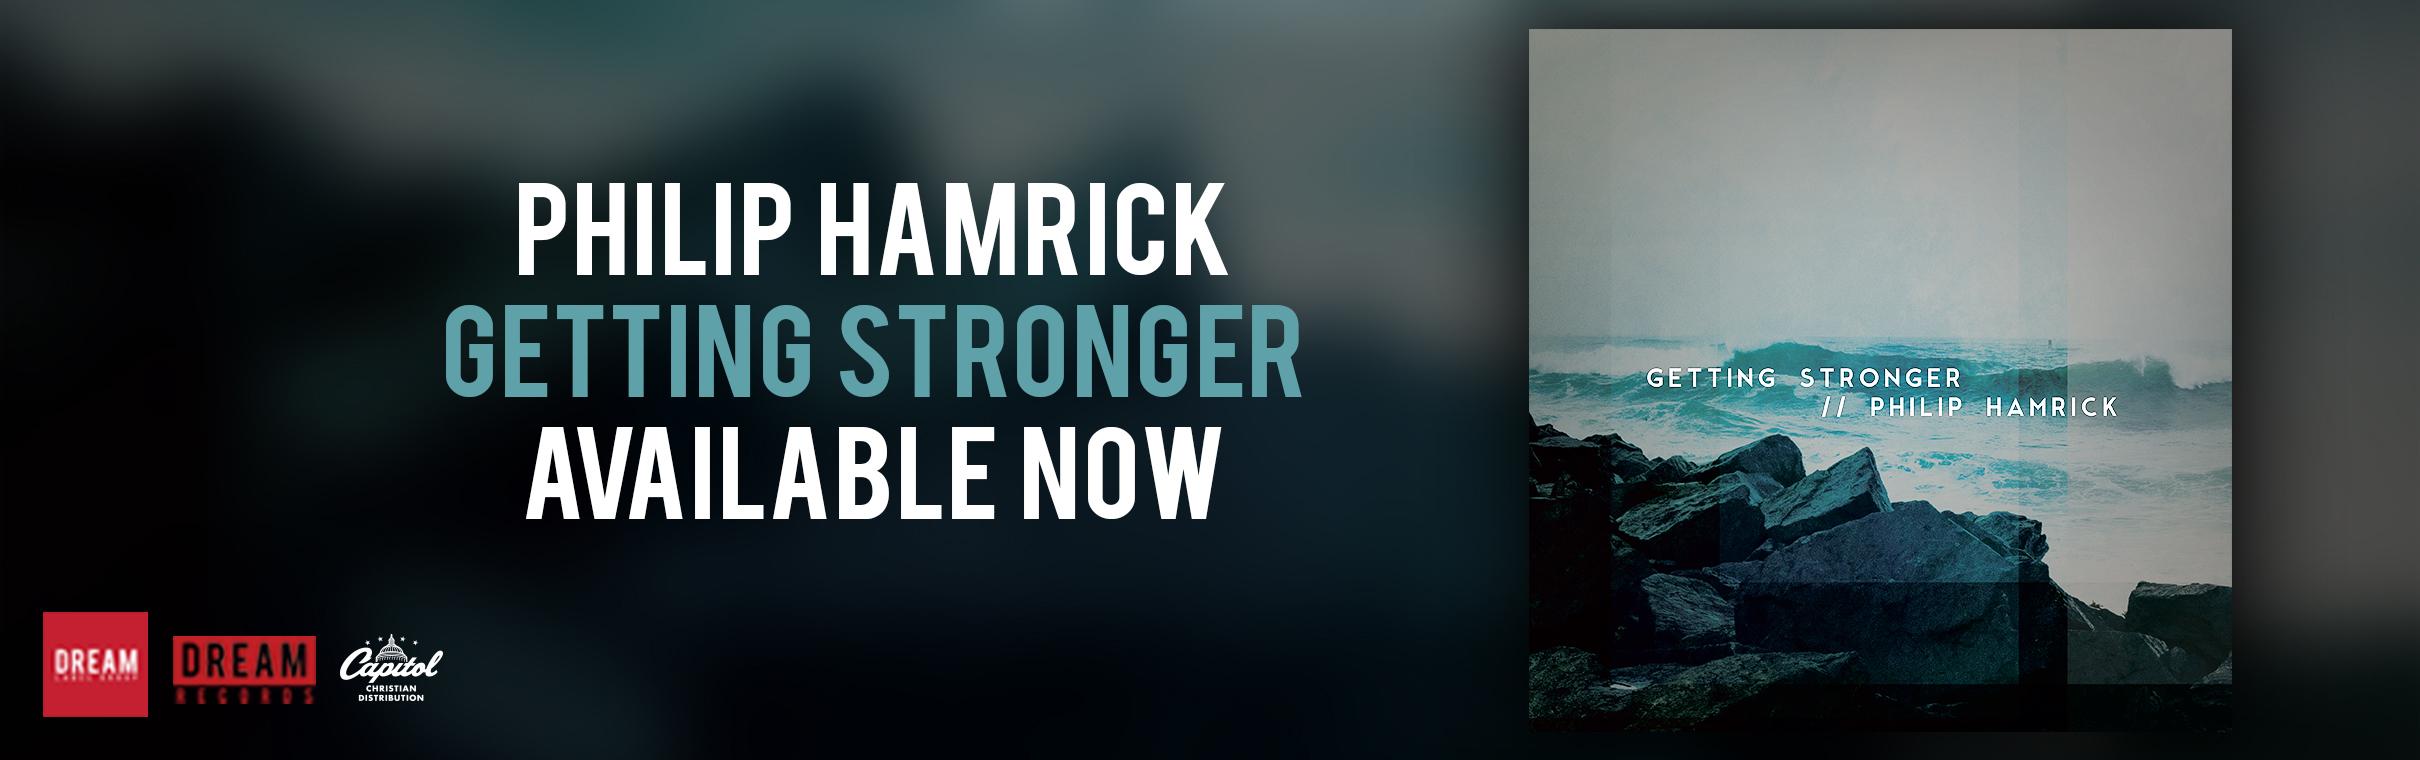 Philip Hamrick